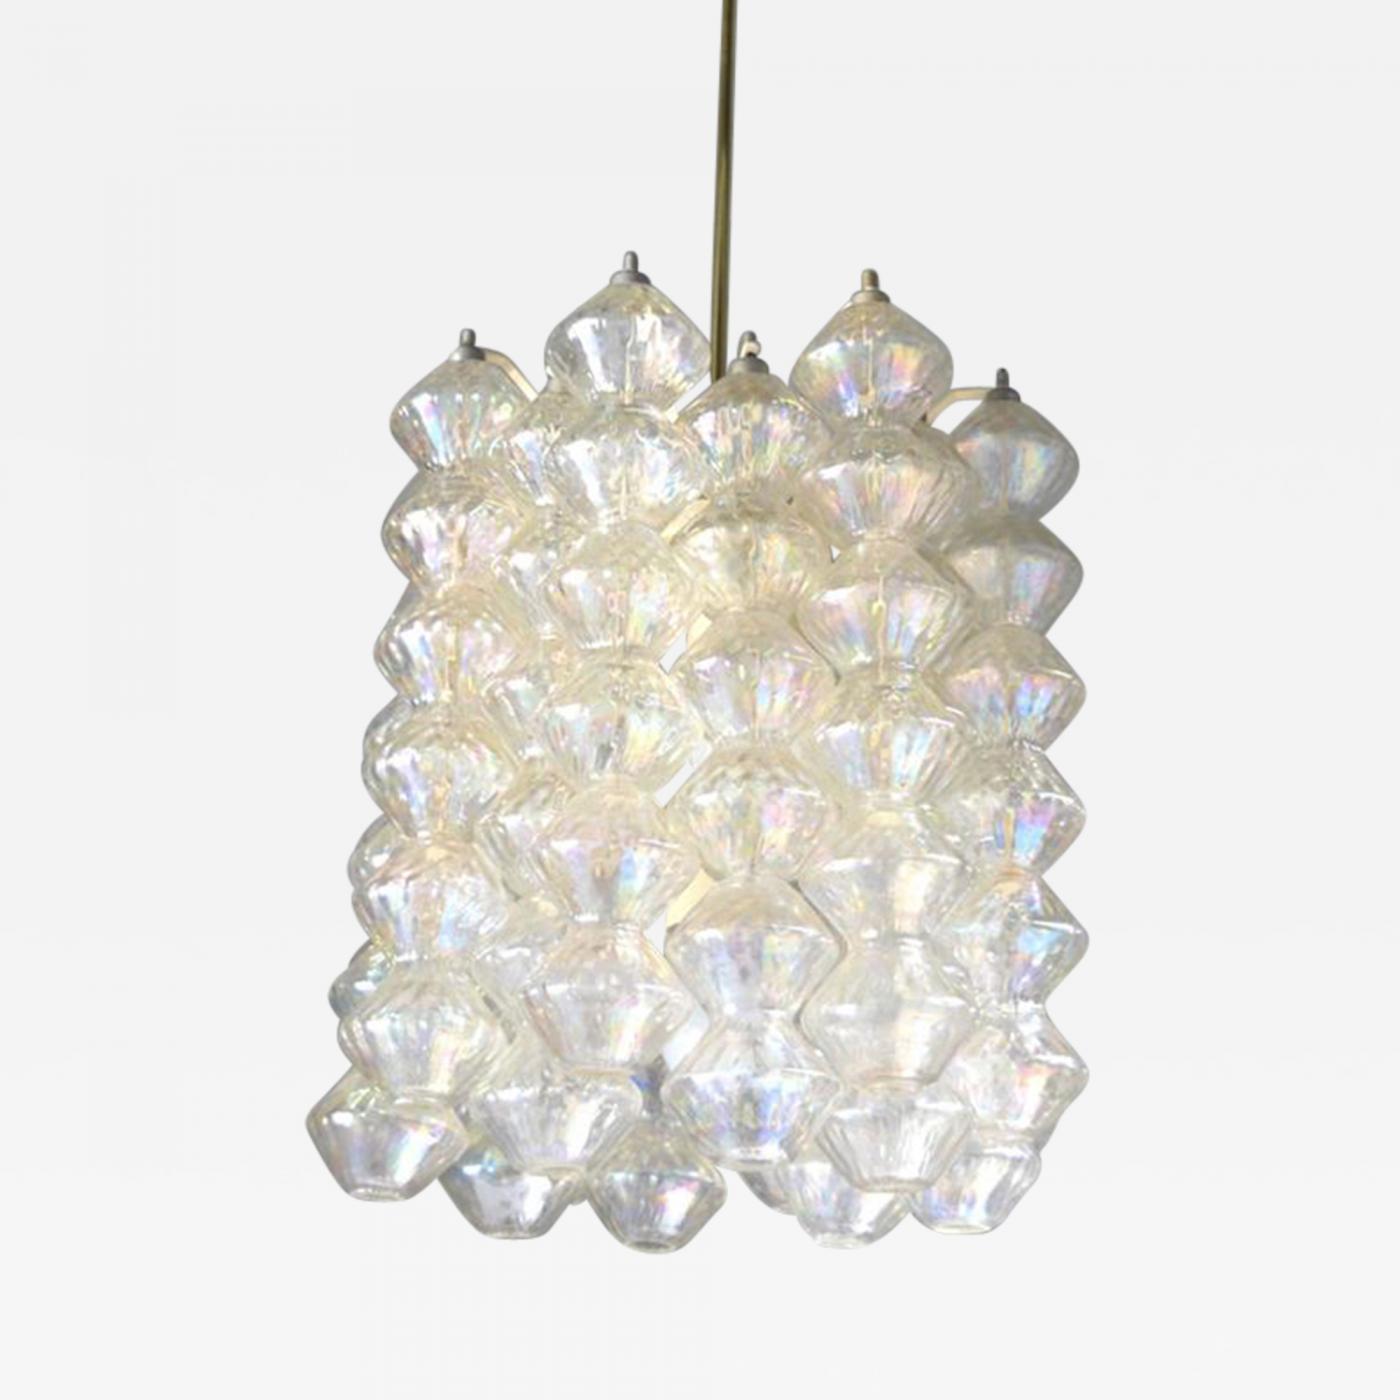 Venini venini chandelier listings furniture lighting chandeliers and pendants venini venini chandelier aloadofball Images